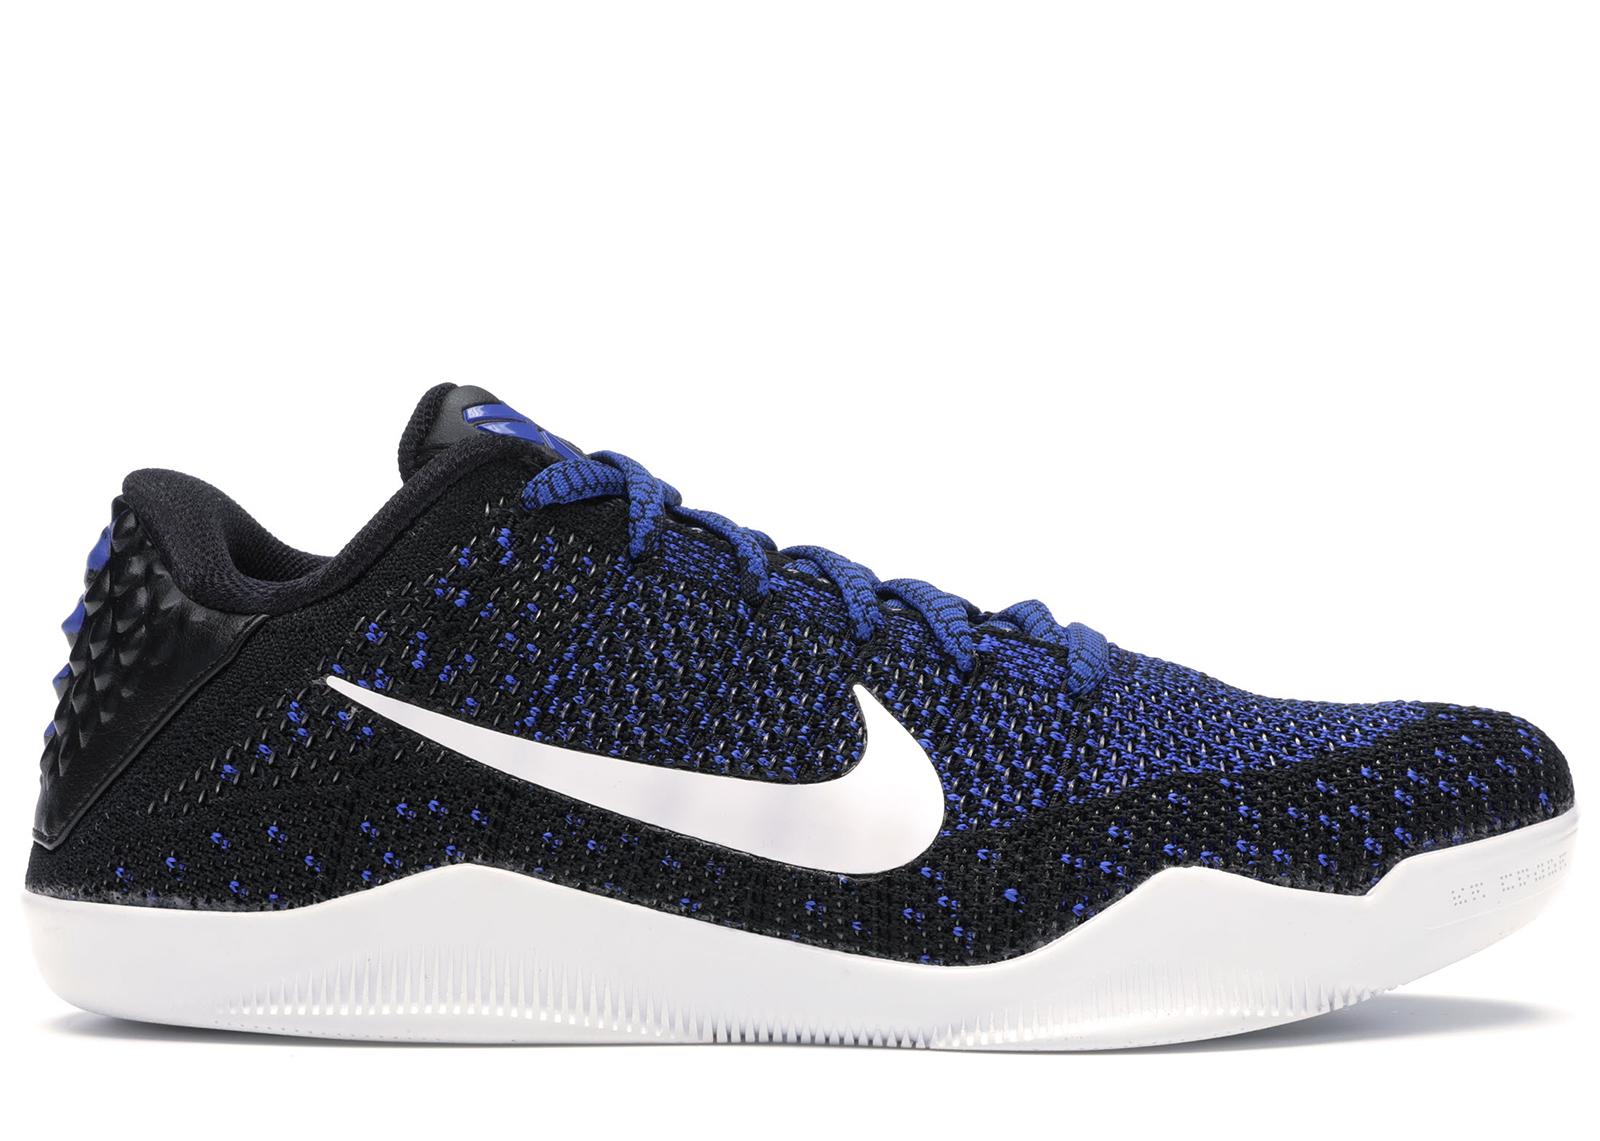 Nike Kobe 11 Elite Low Mark Parker